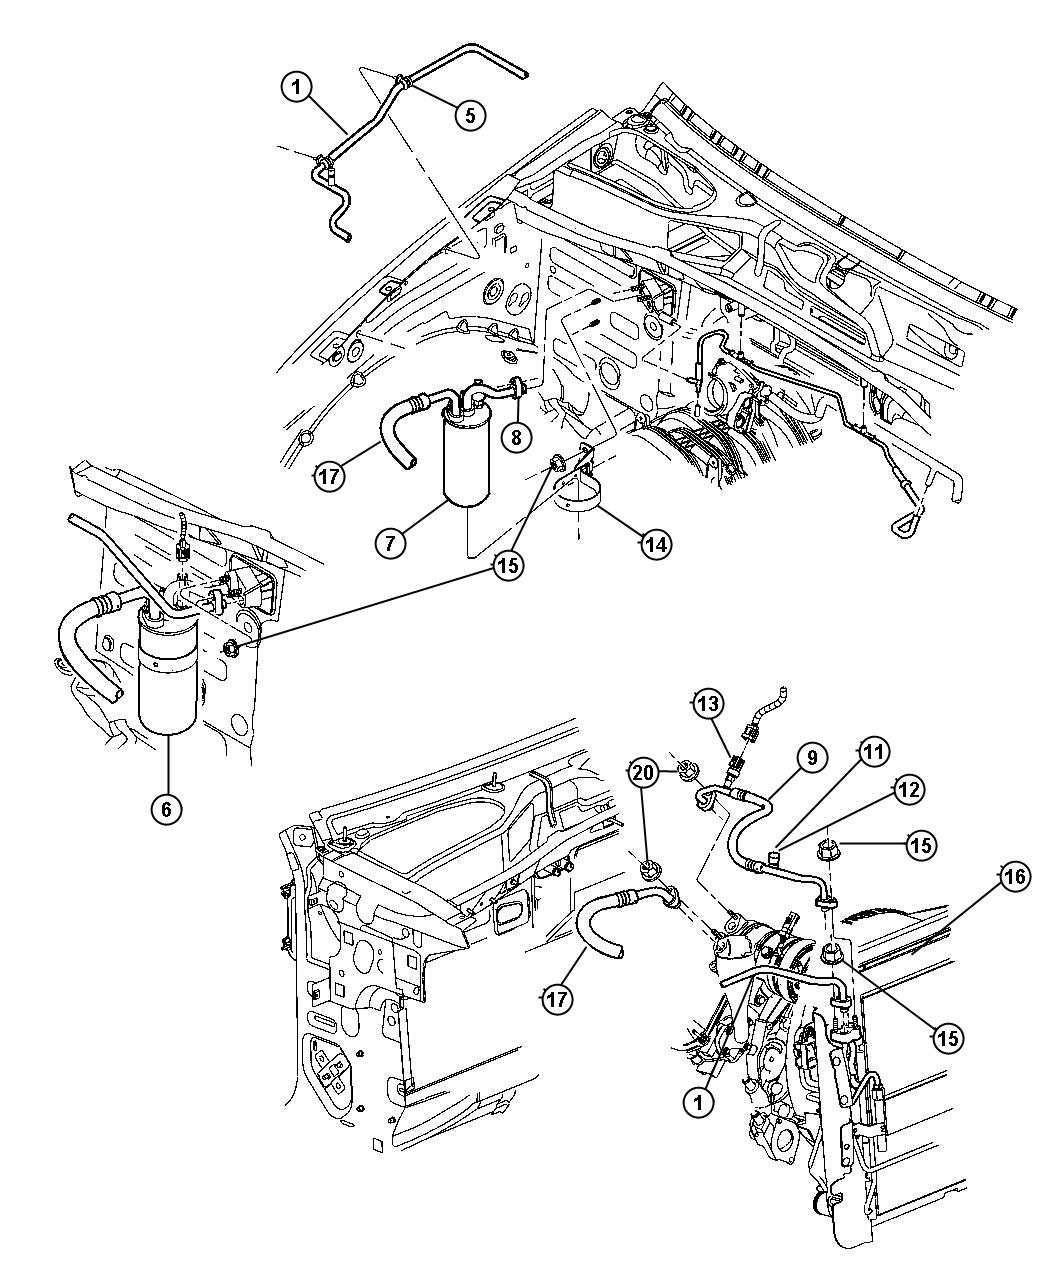 Jeep Liberty Transducer, transducer kit. A/c pressure